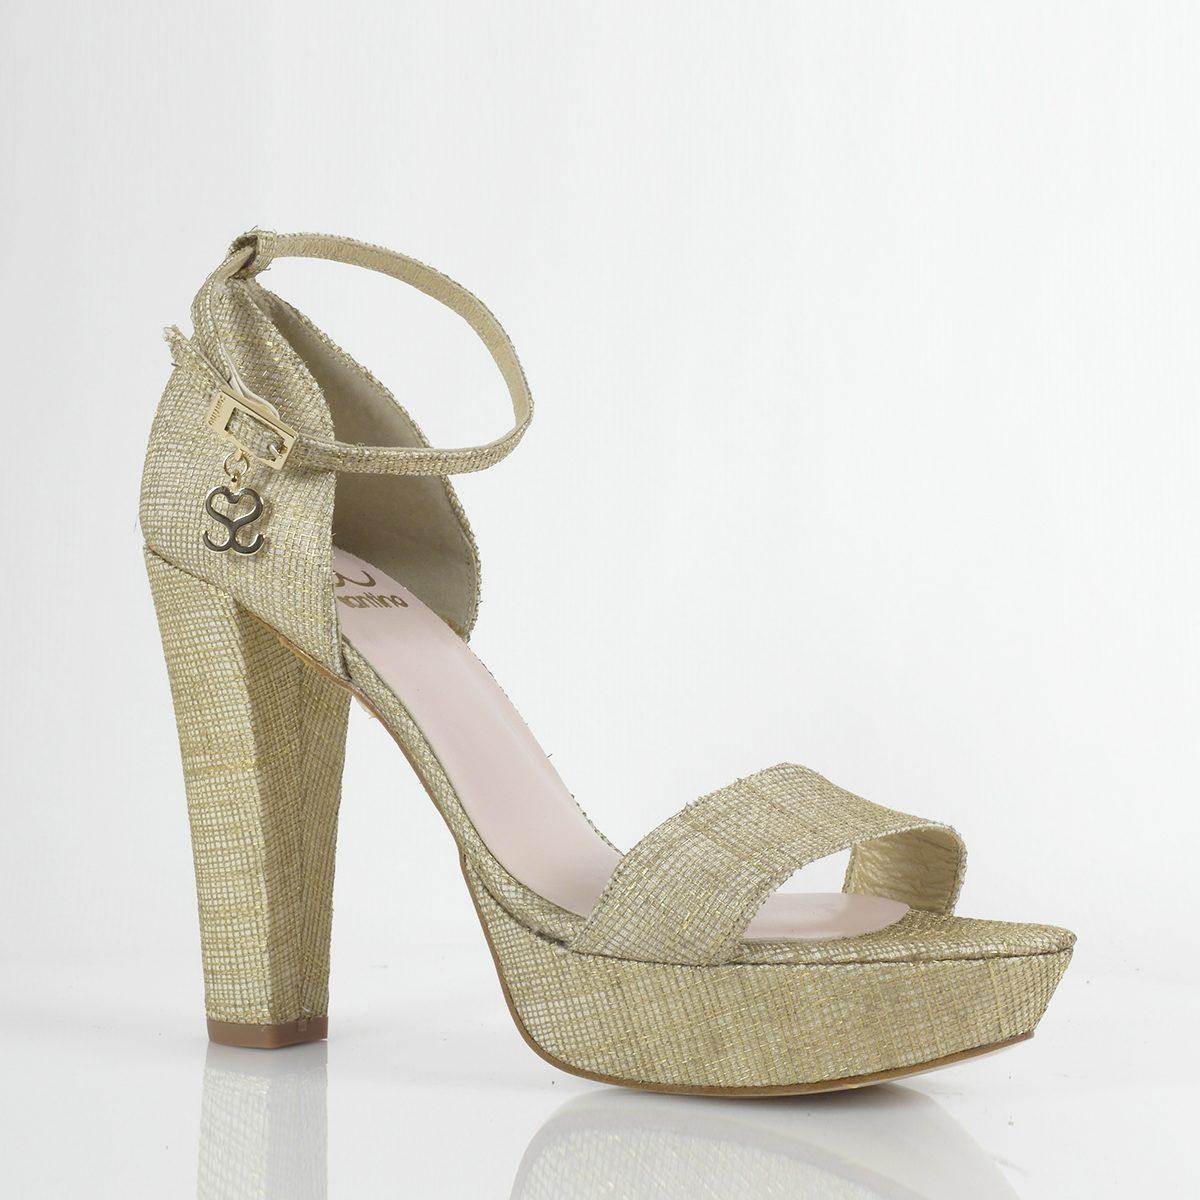 SANDALIA MOD.1378 (11cm) - zapatos personalizados fiesta